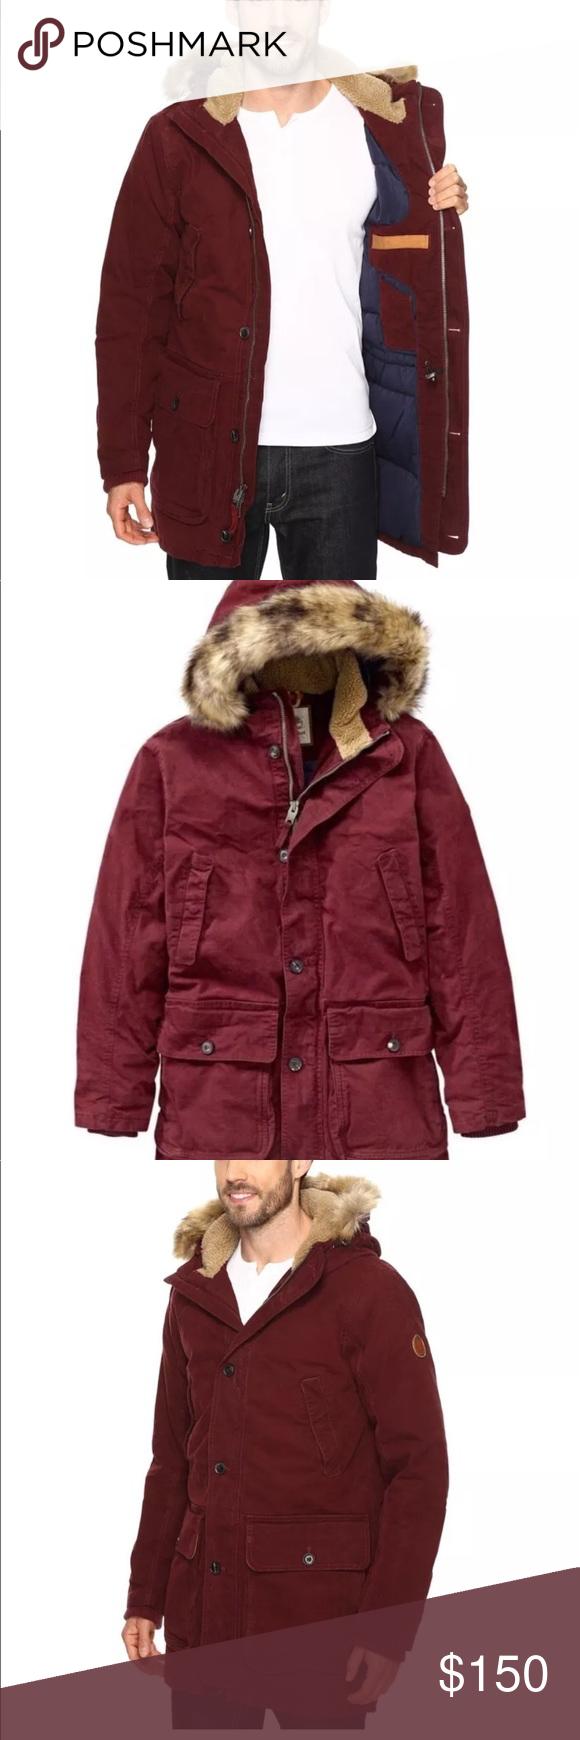 62bcec0456d Men's TIMBERLAND winter coat $398 Timberland Men's Scar Ridge Waxed ...